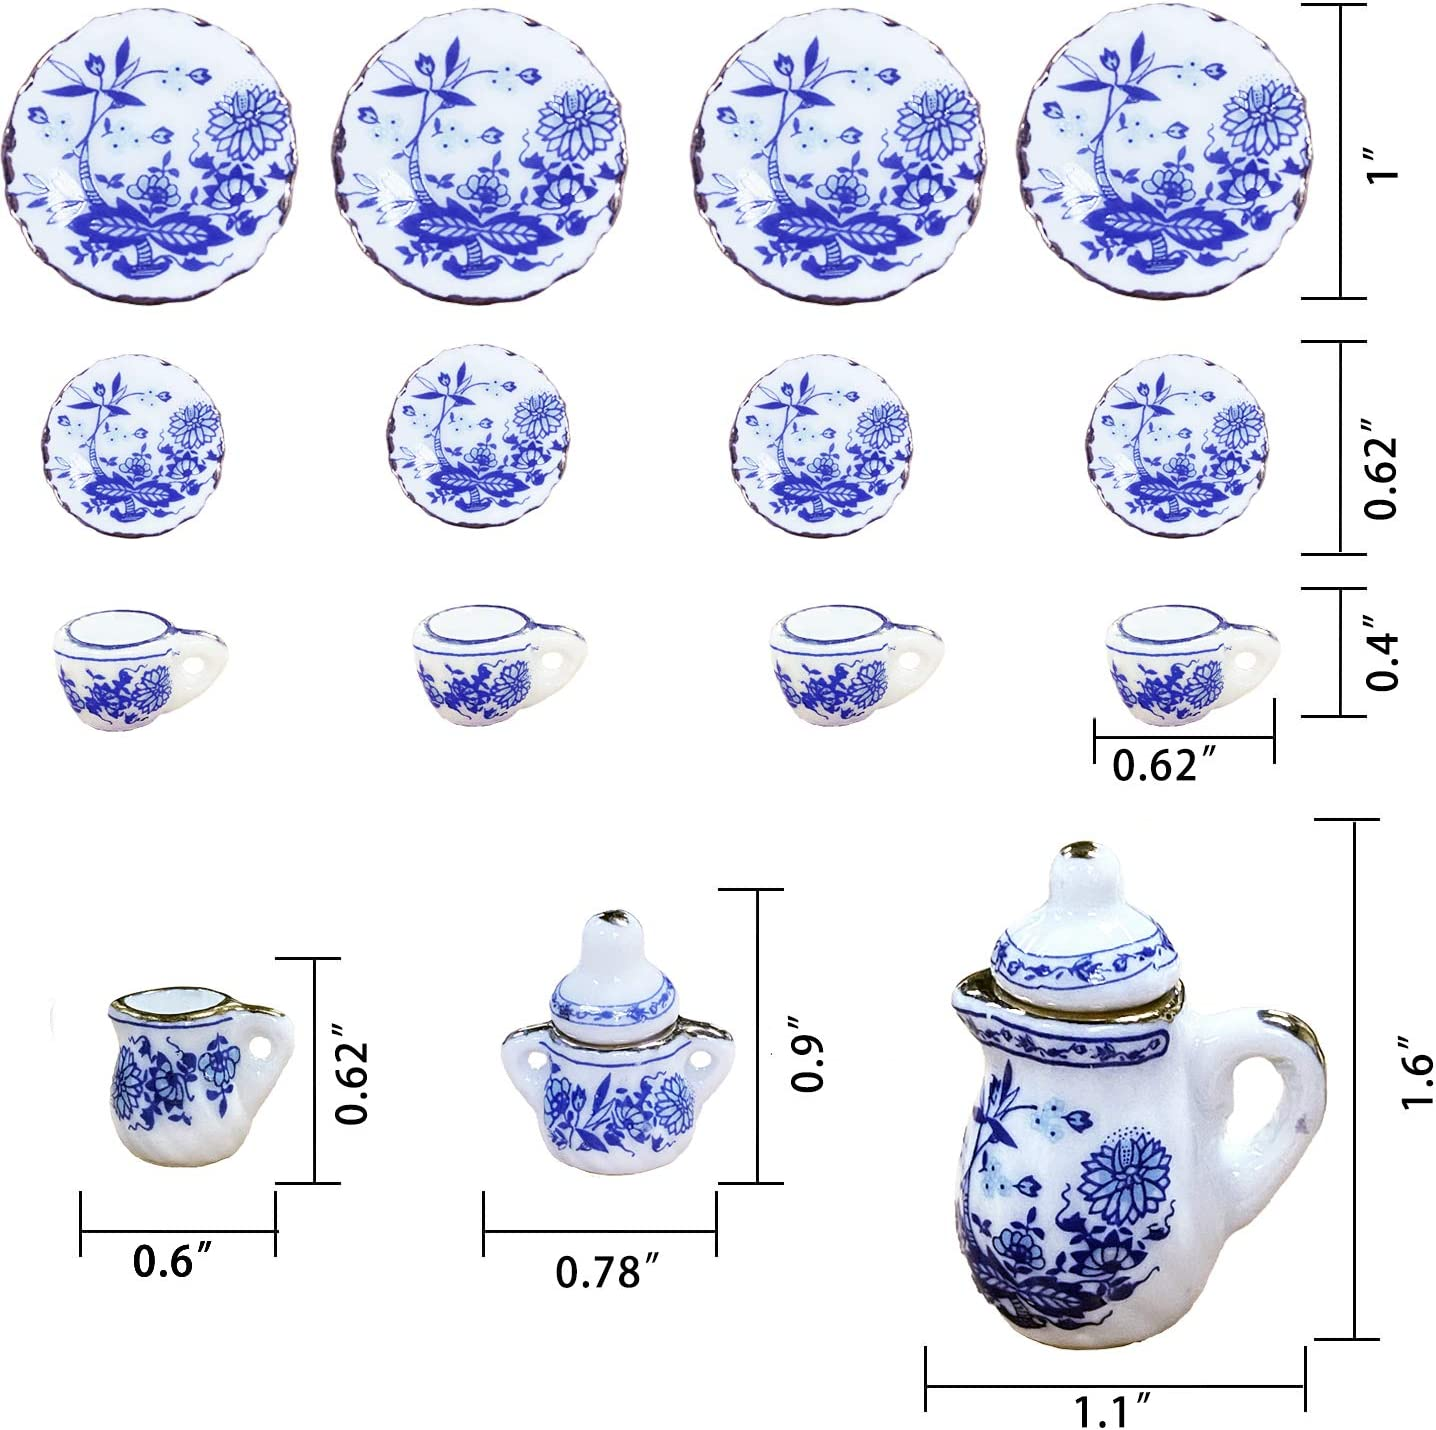 Arocalens J 1:12 Scale Mini Dollhouse Tea Set for Little Girls Miniature Small Barbie Kitchen Tea Cups Party Plates Accessories Porcelain(15pcs Blossom)